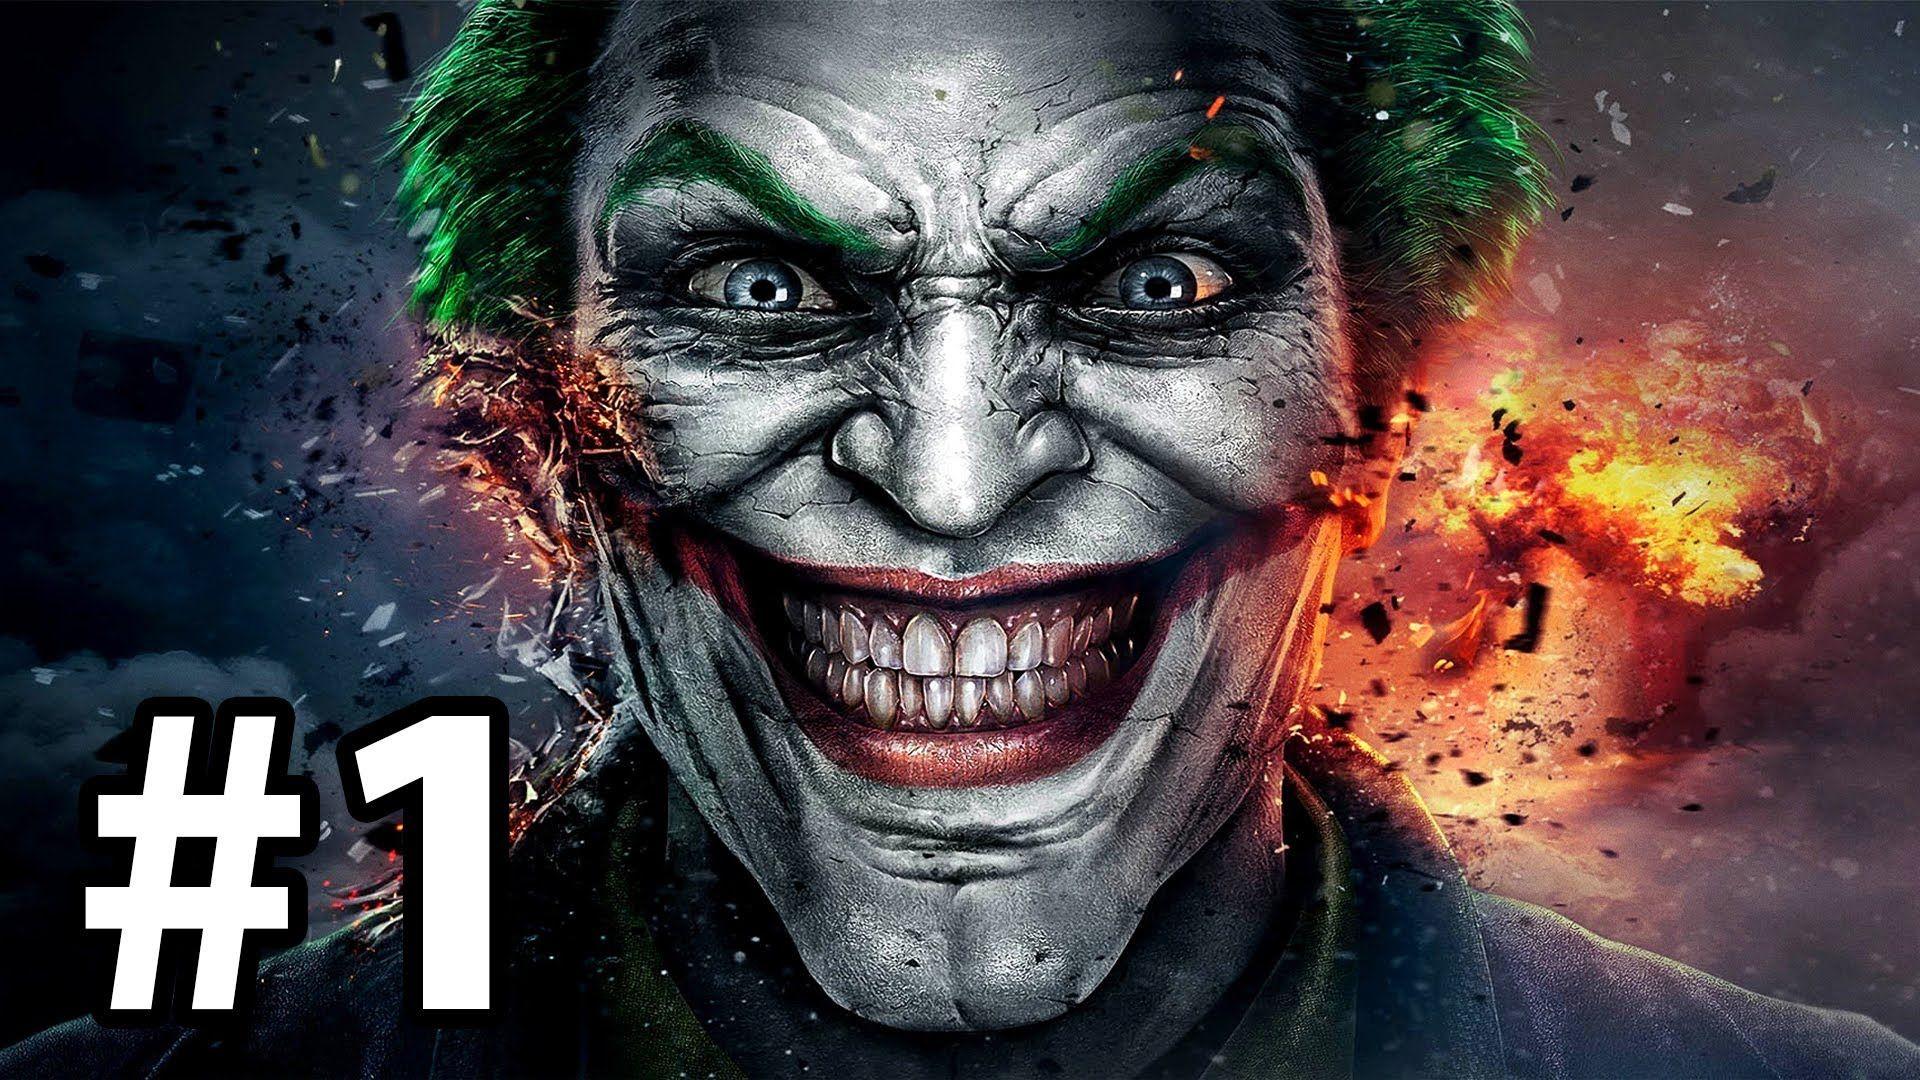 Injustice Gods Among Us Gameplay Ps3 Imagenes De Joker Joker El Guason